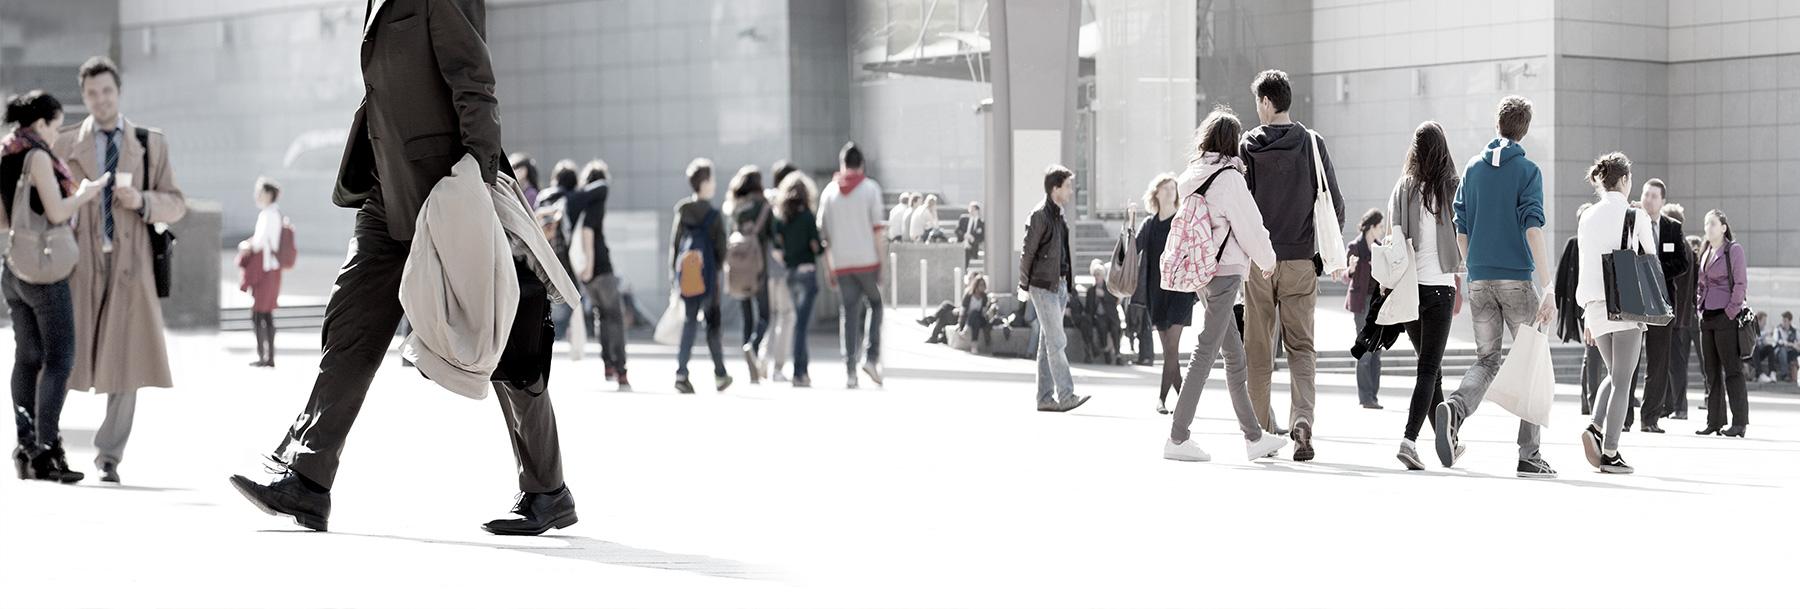 people walking background